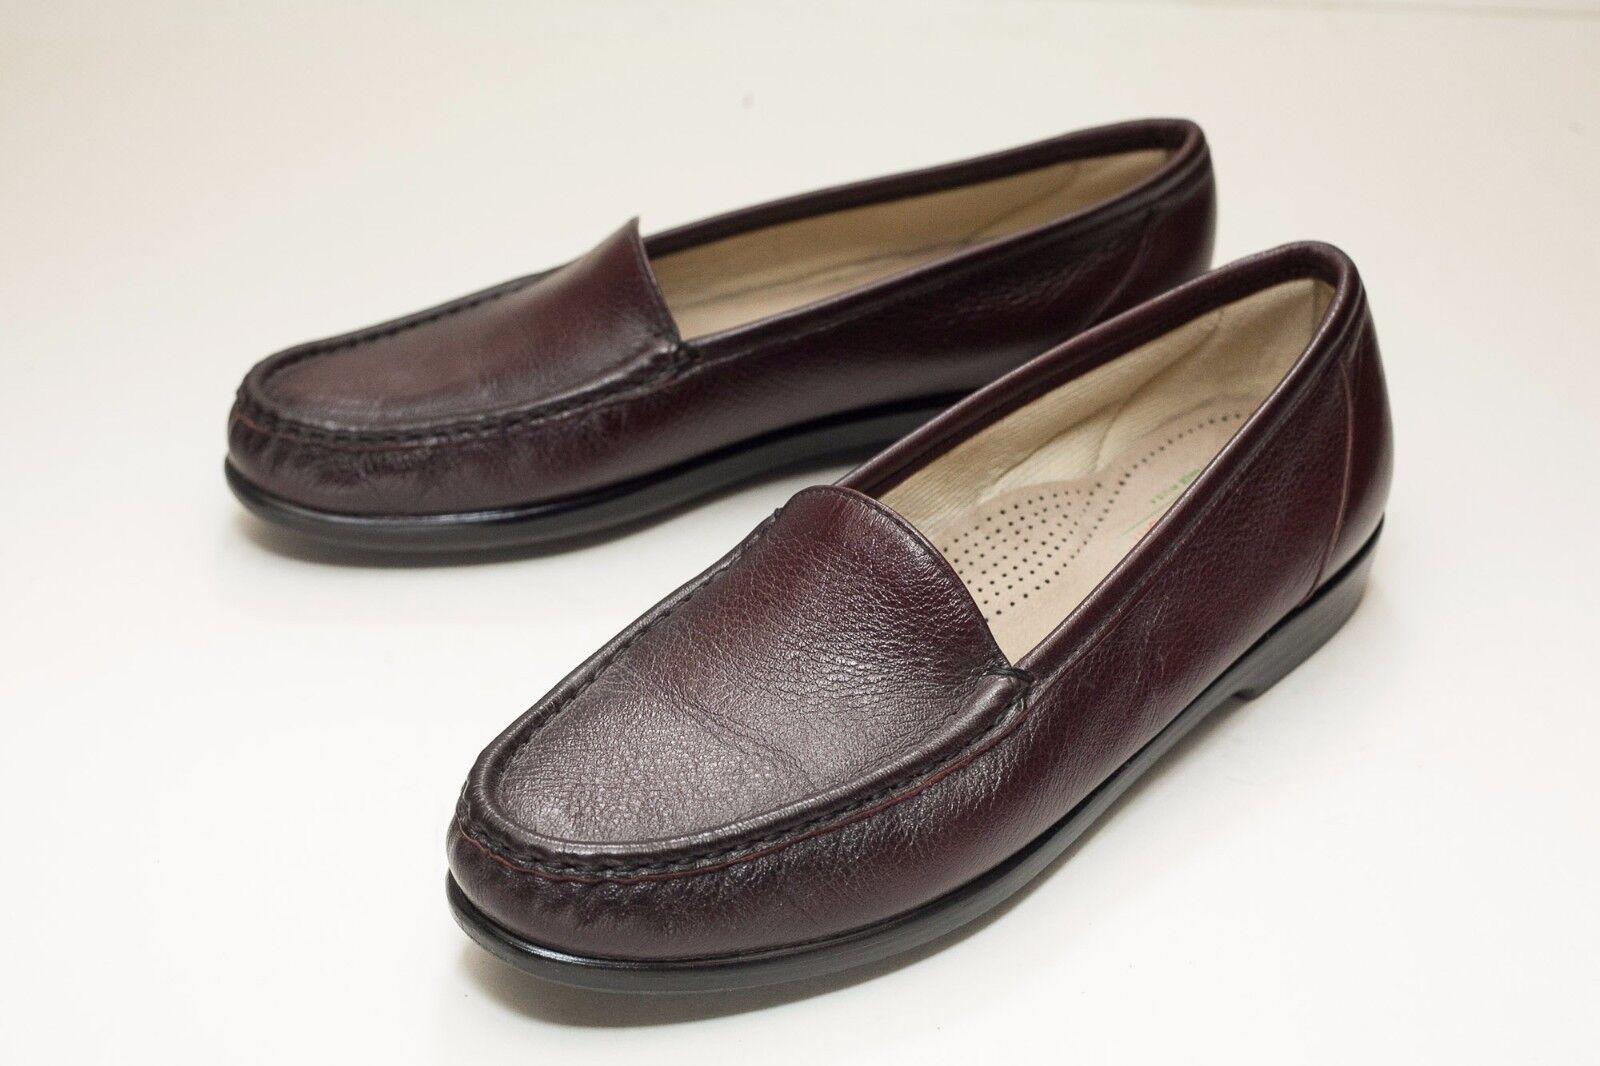 SAS 9 N Marron Slip On Chaussures Femme